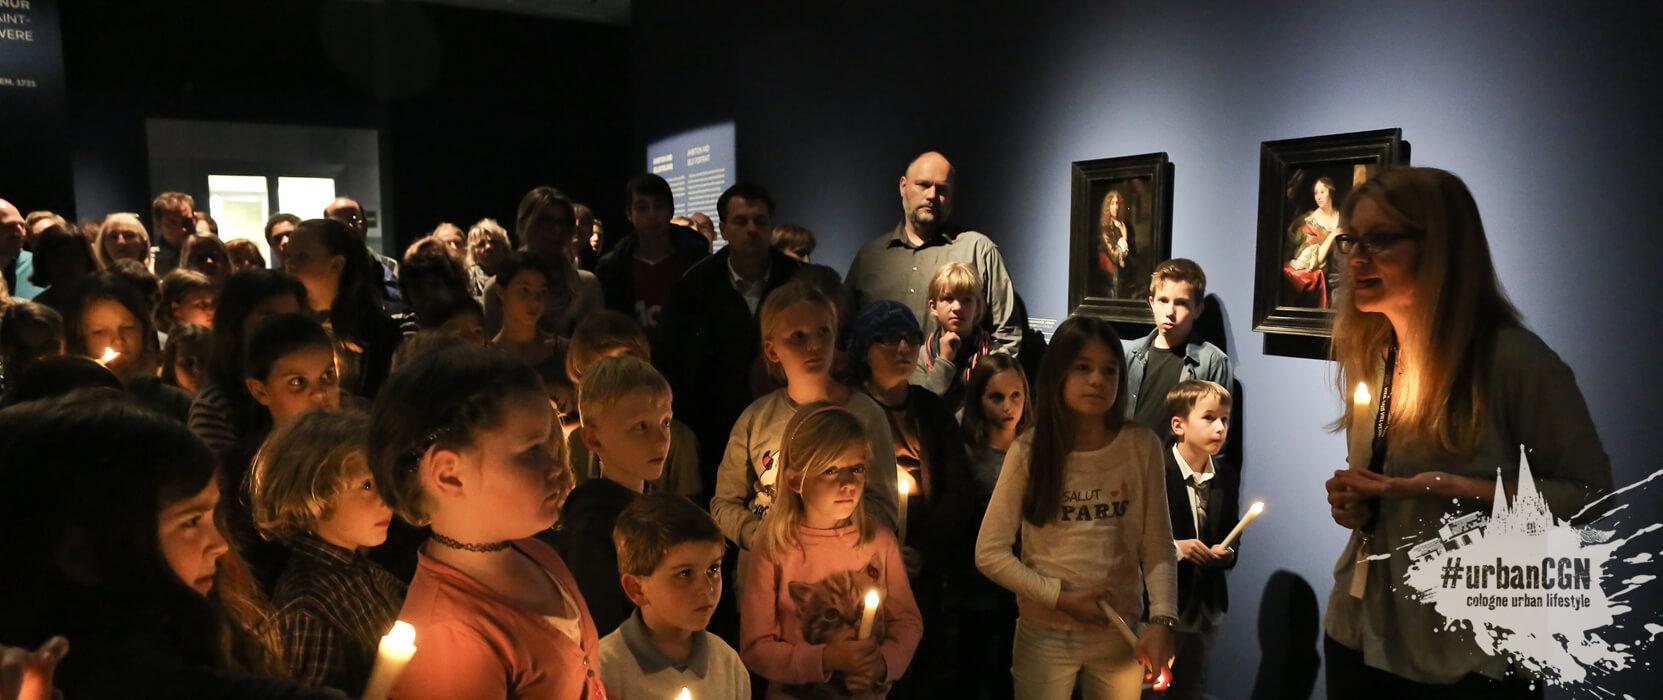 Museumsnacht Köln, Foto: Taimas Ahangari ©Stadtrevue Verlag Köln